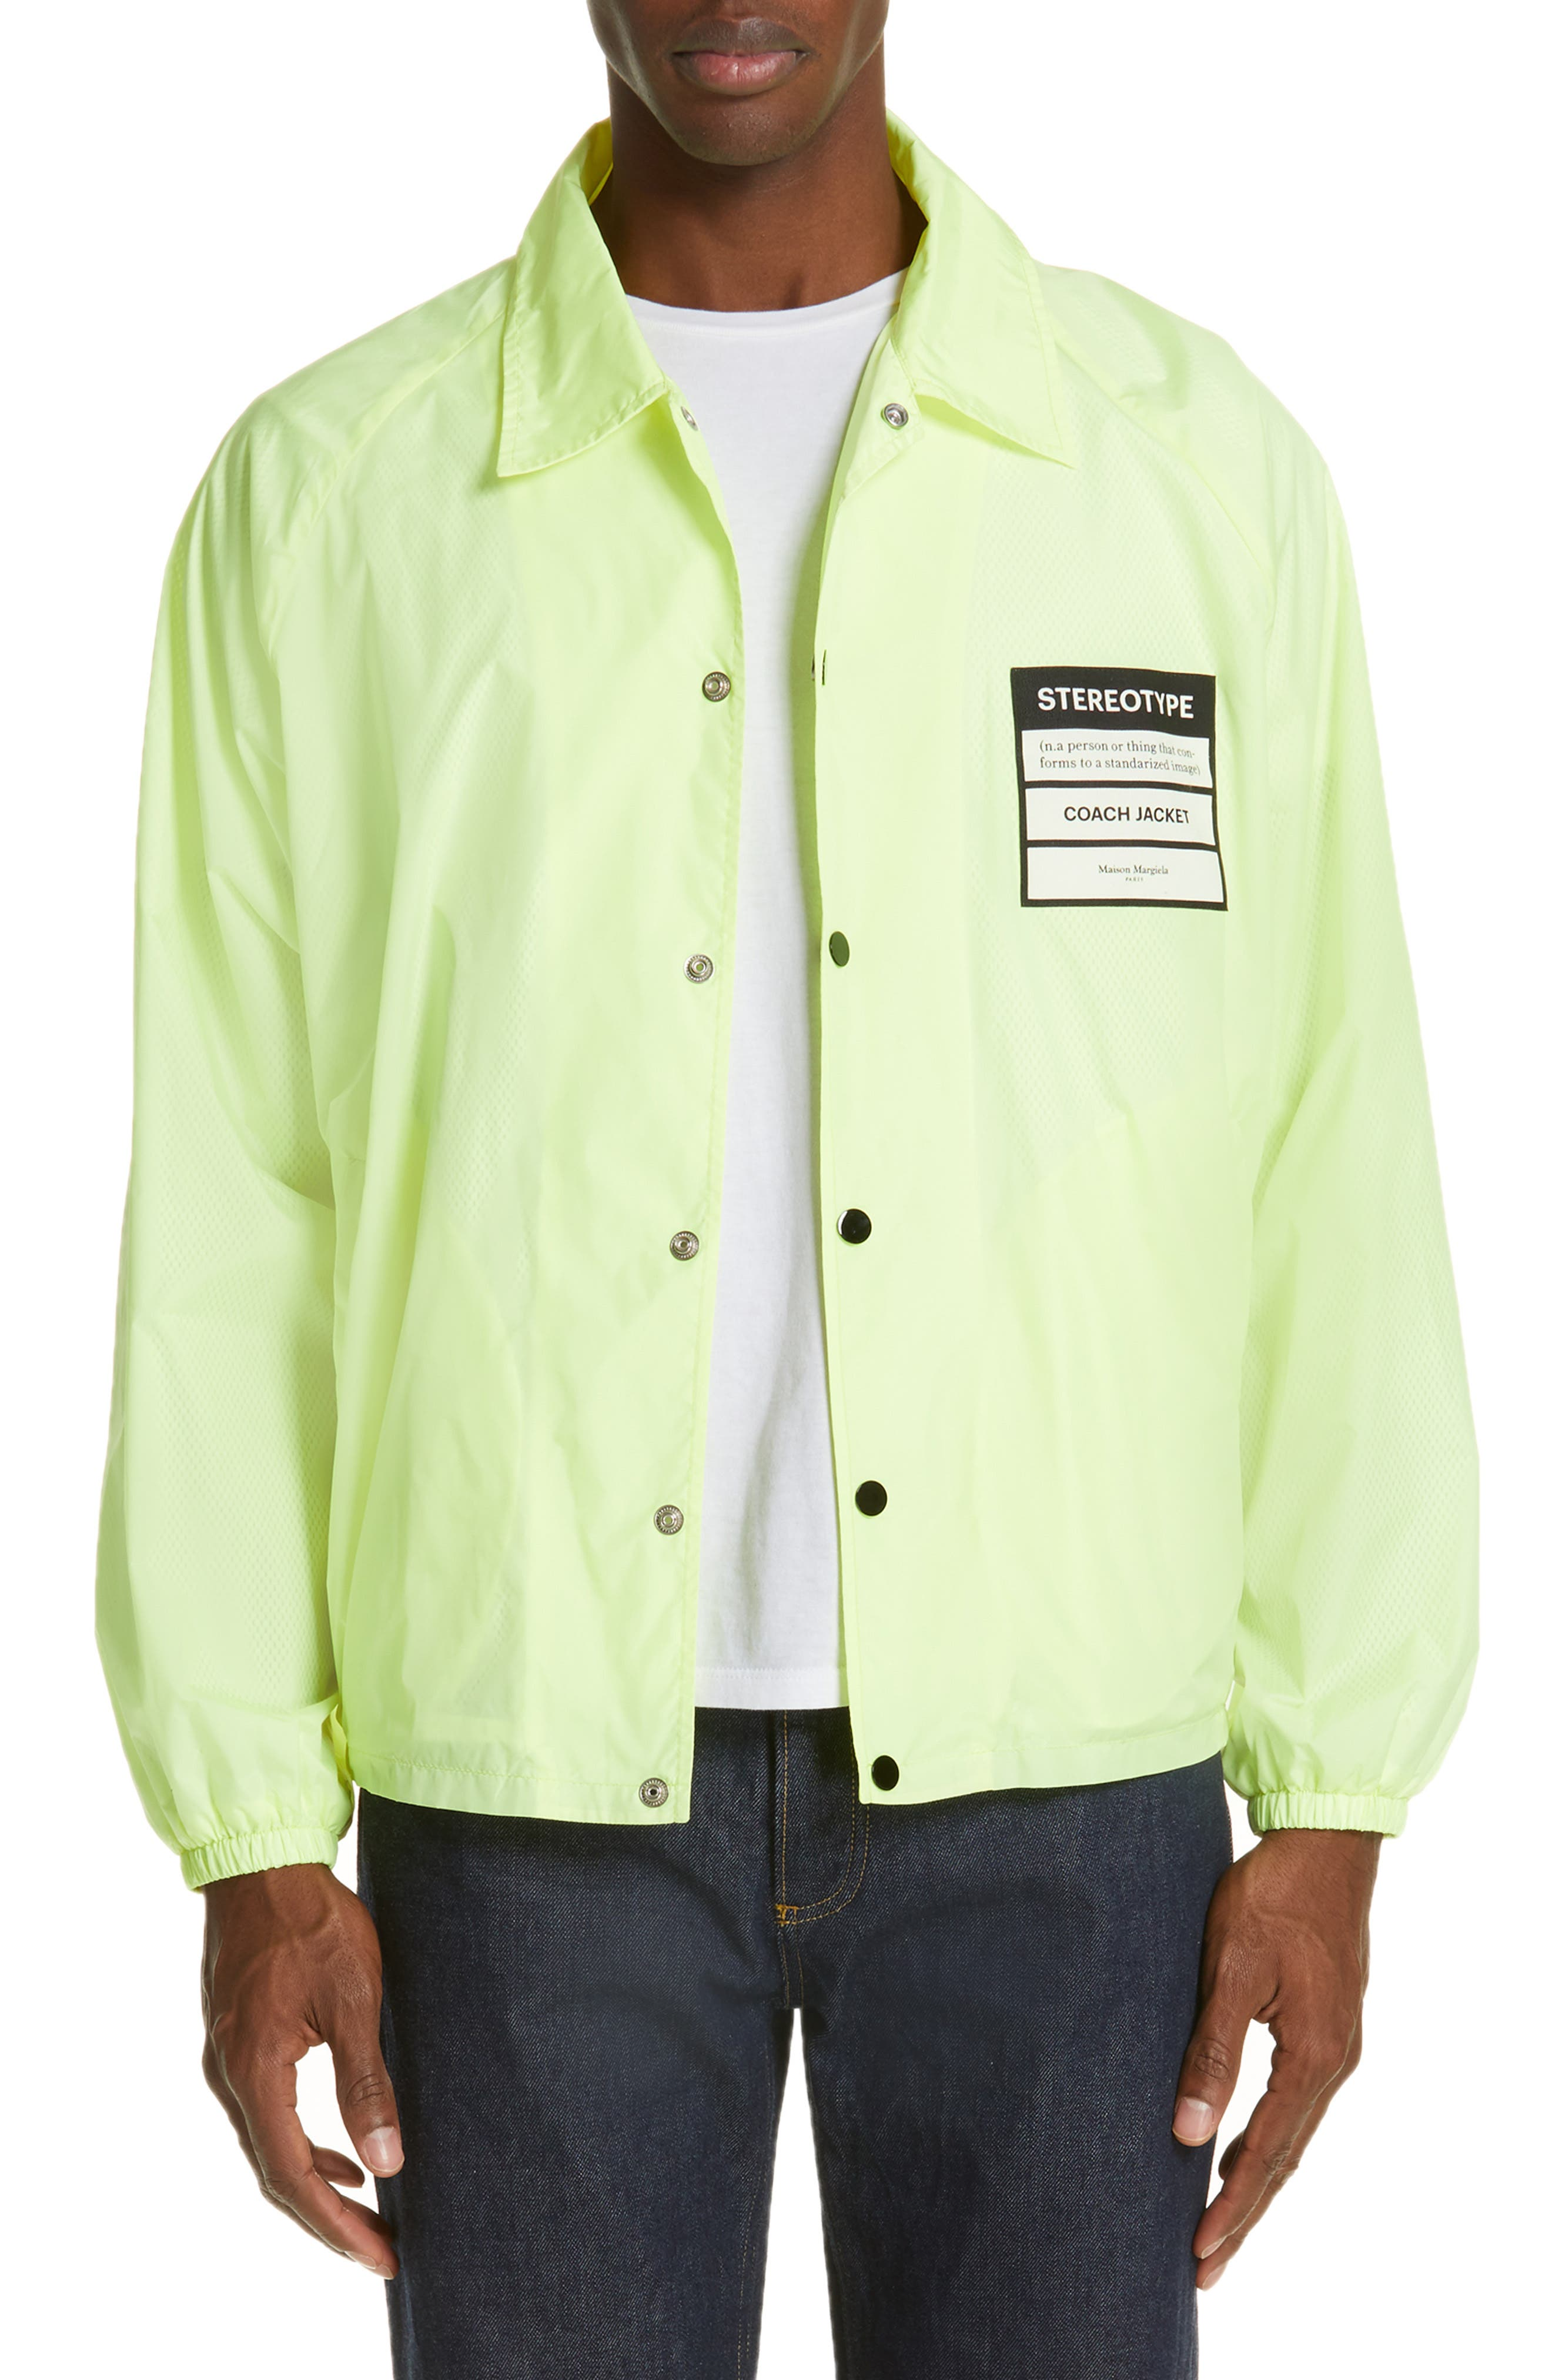 MAISON MARGIELA Stereotype Coach's Jacket, Main, color, NEON YELLOW